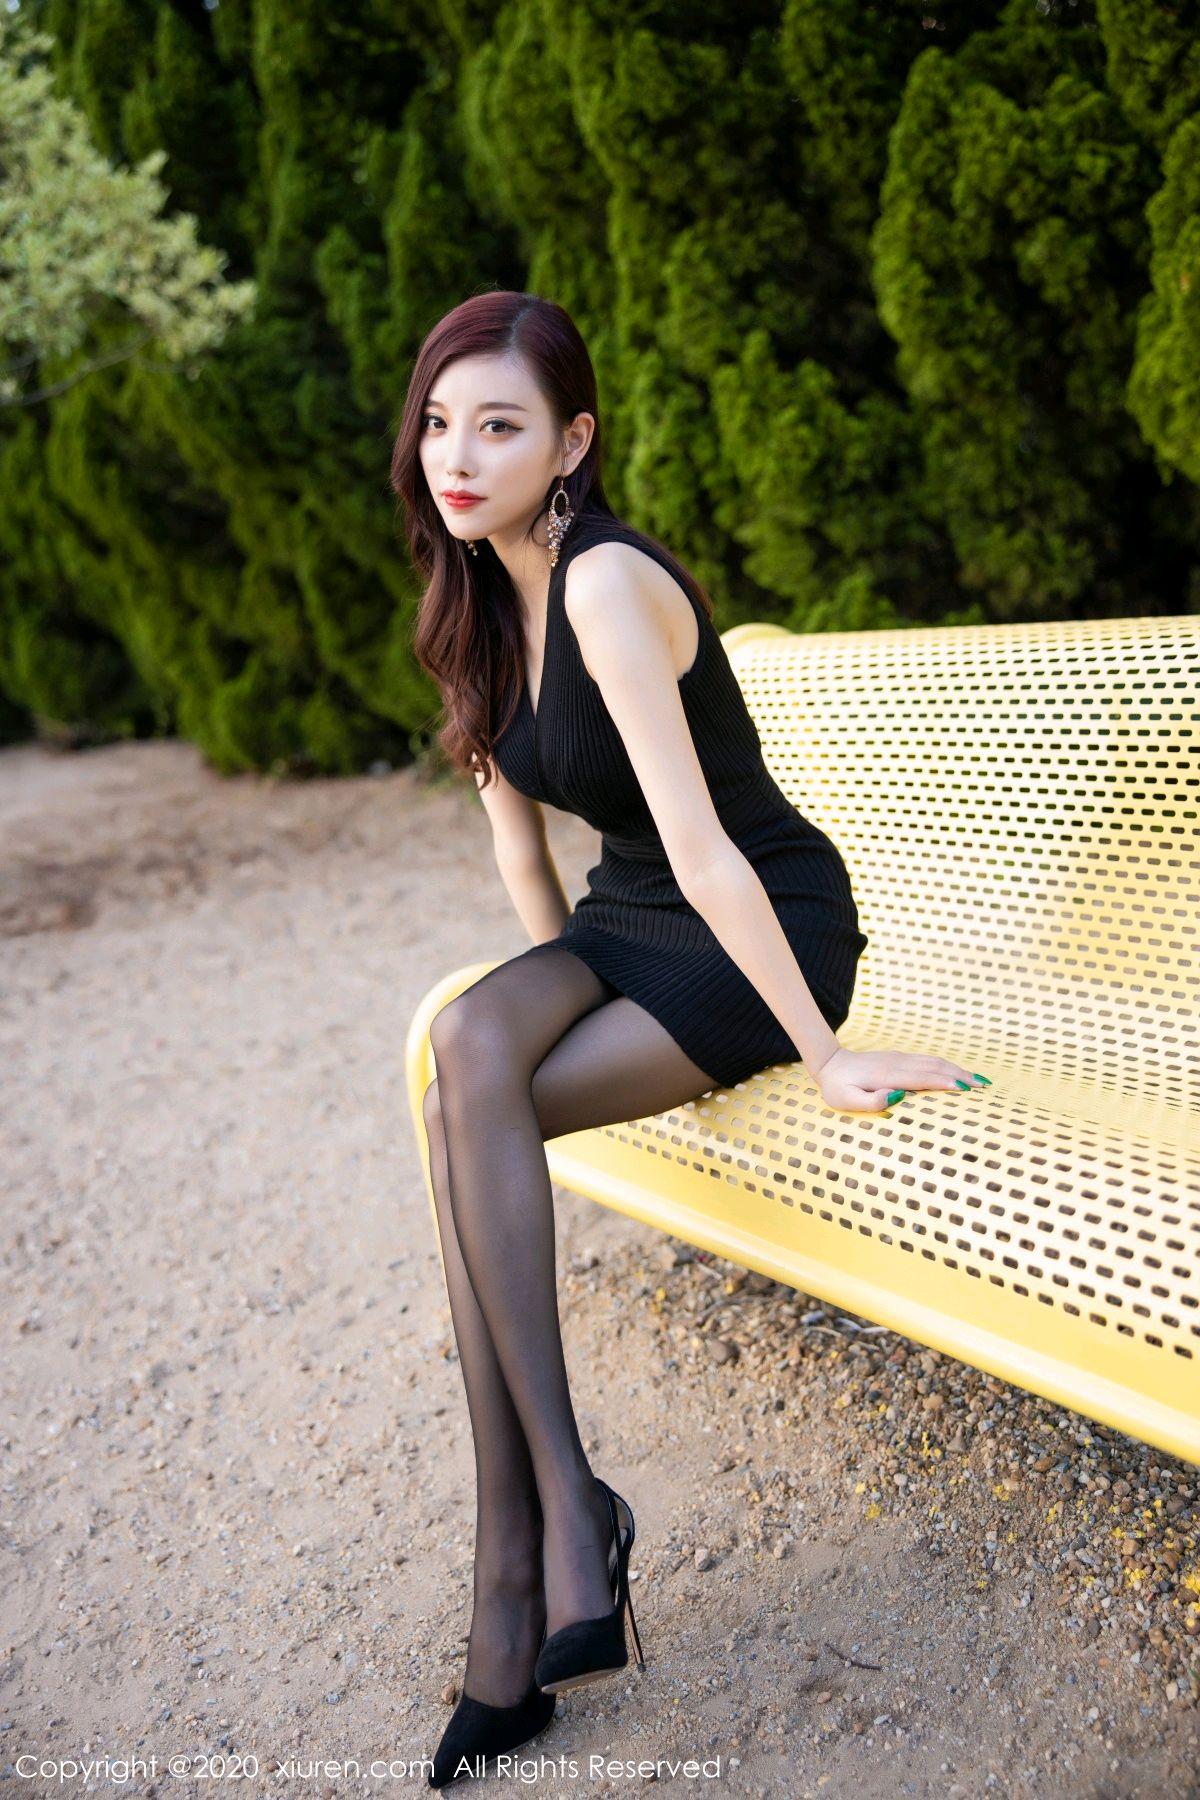 [XiuRen] Vol.2648 Yang Chen Chen 46P, Black Silk, Outdoor, Xiuren, Yang Chen Chen